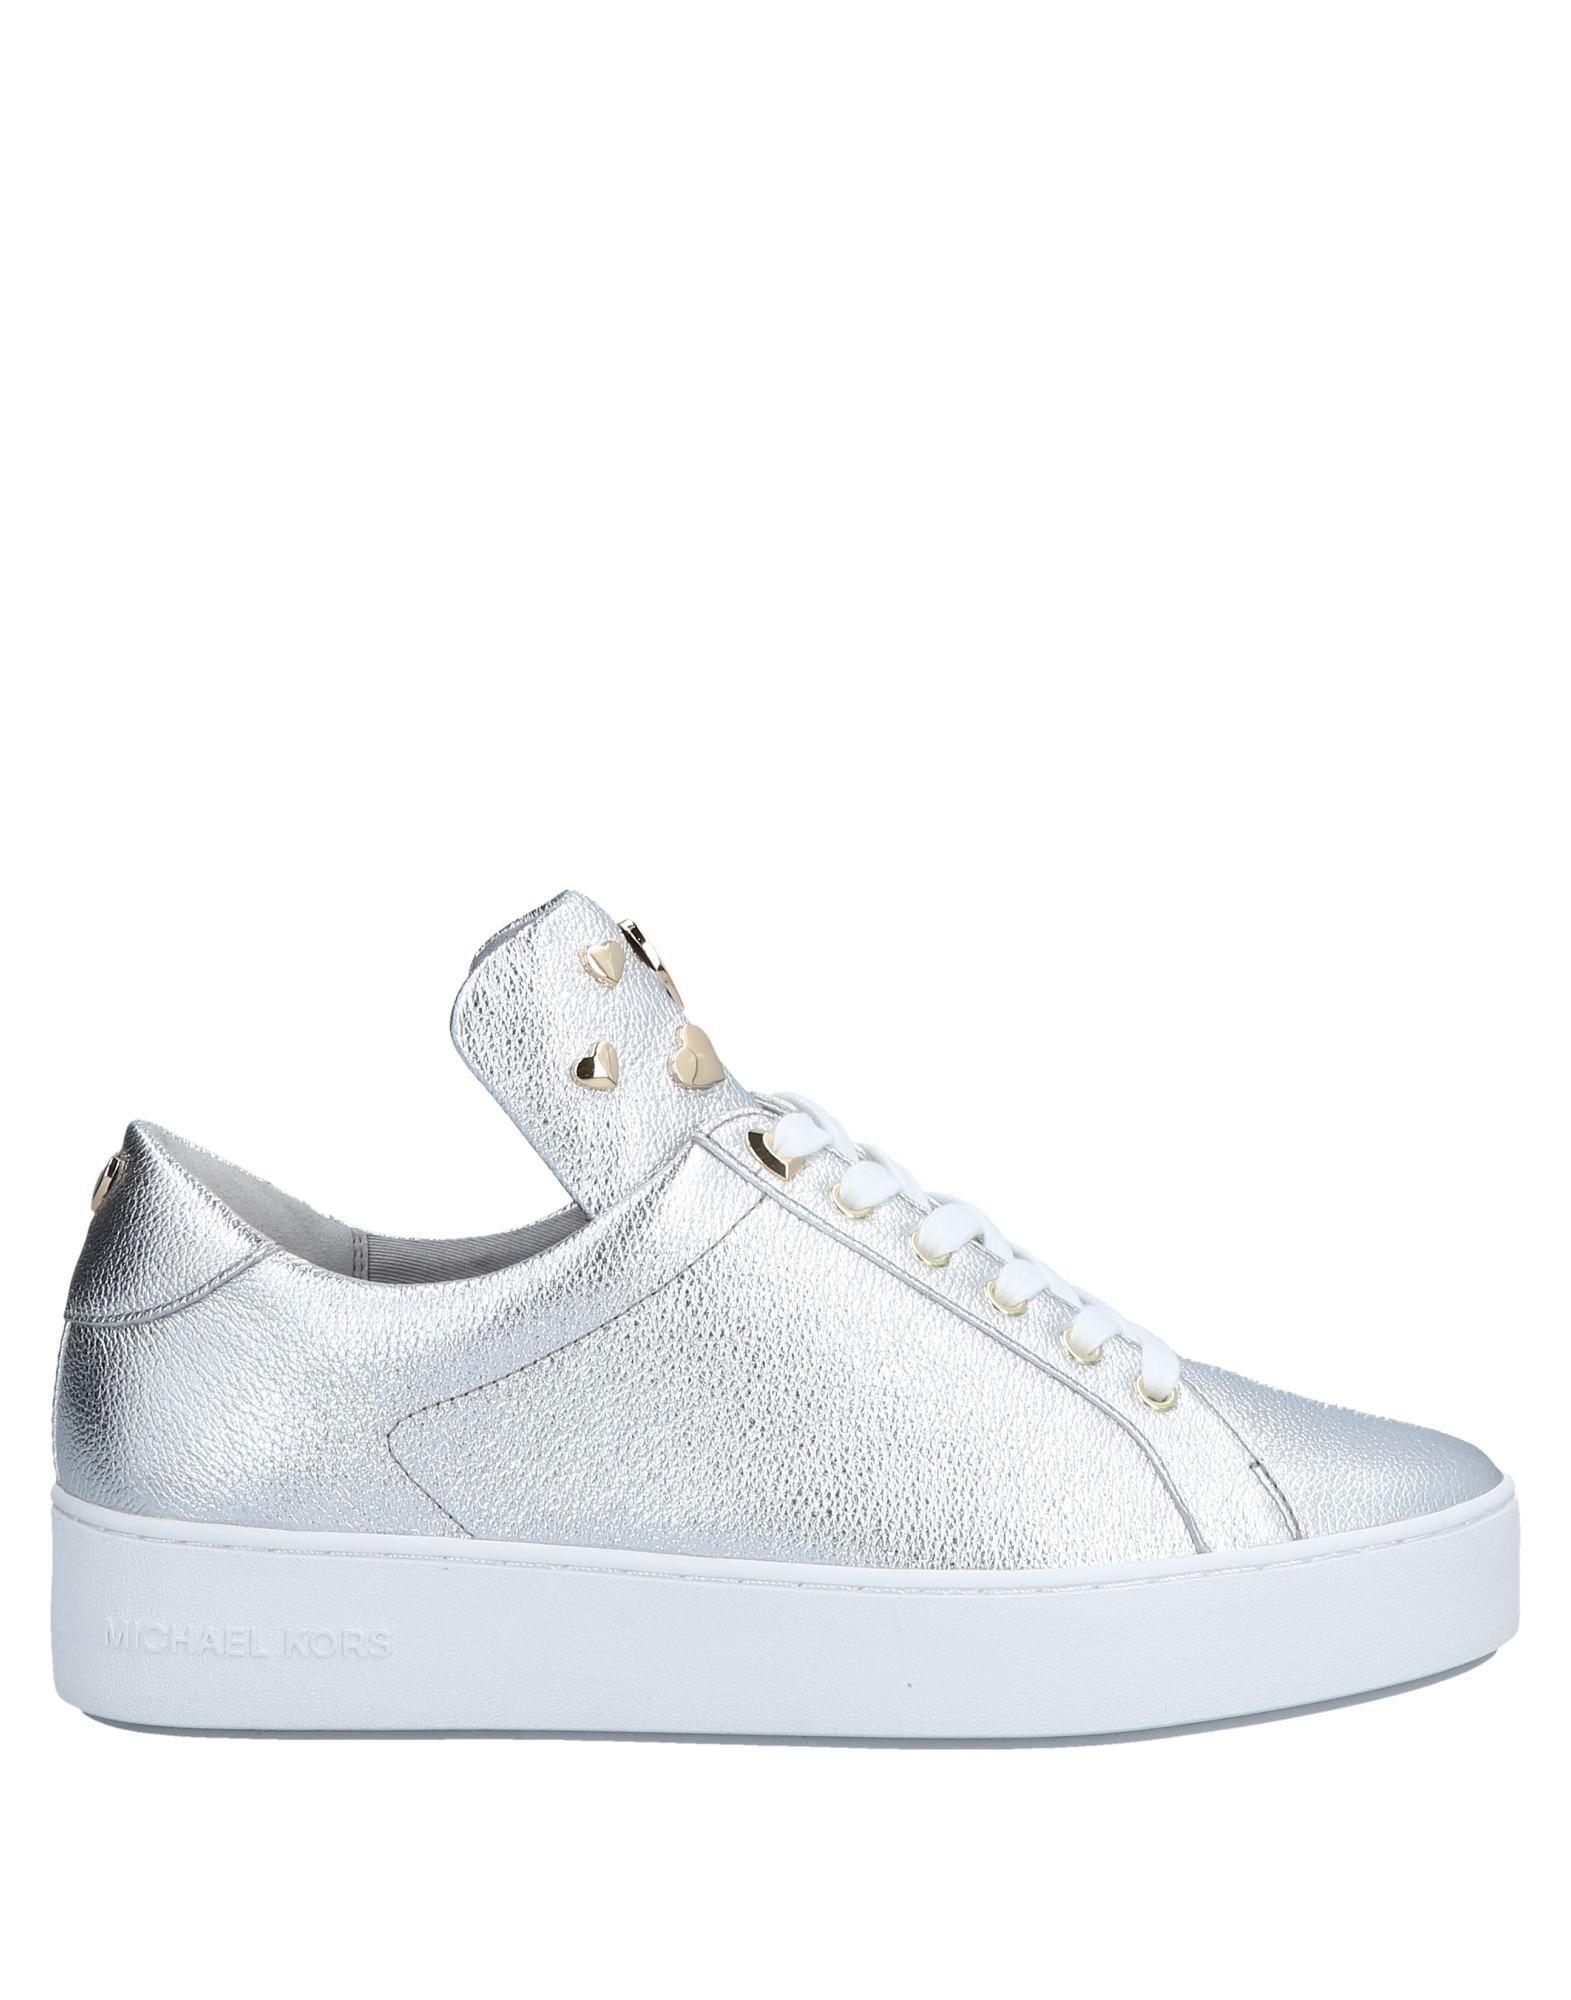 a83518911a MICHAEL MICHAEL KORS ΠΑΠΟΥΤΣΙΑ Παπούτσια τένις χαμηλά